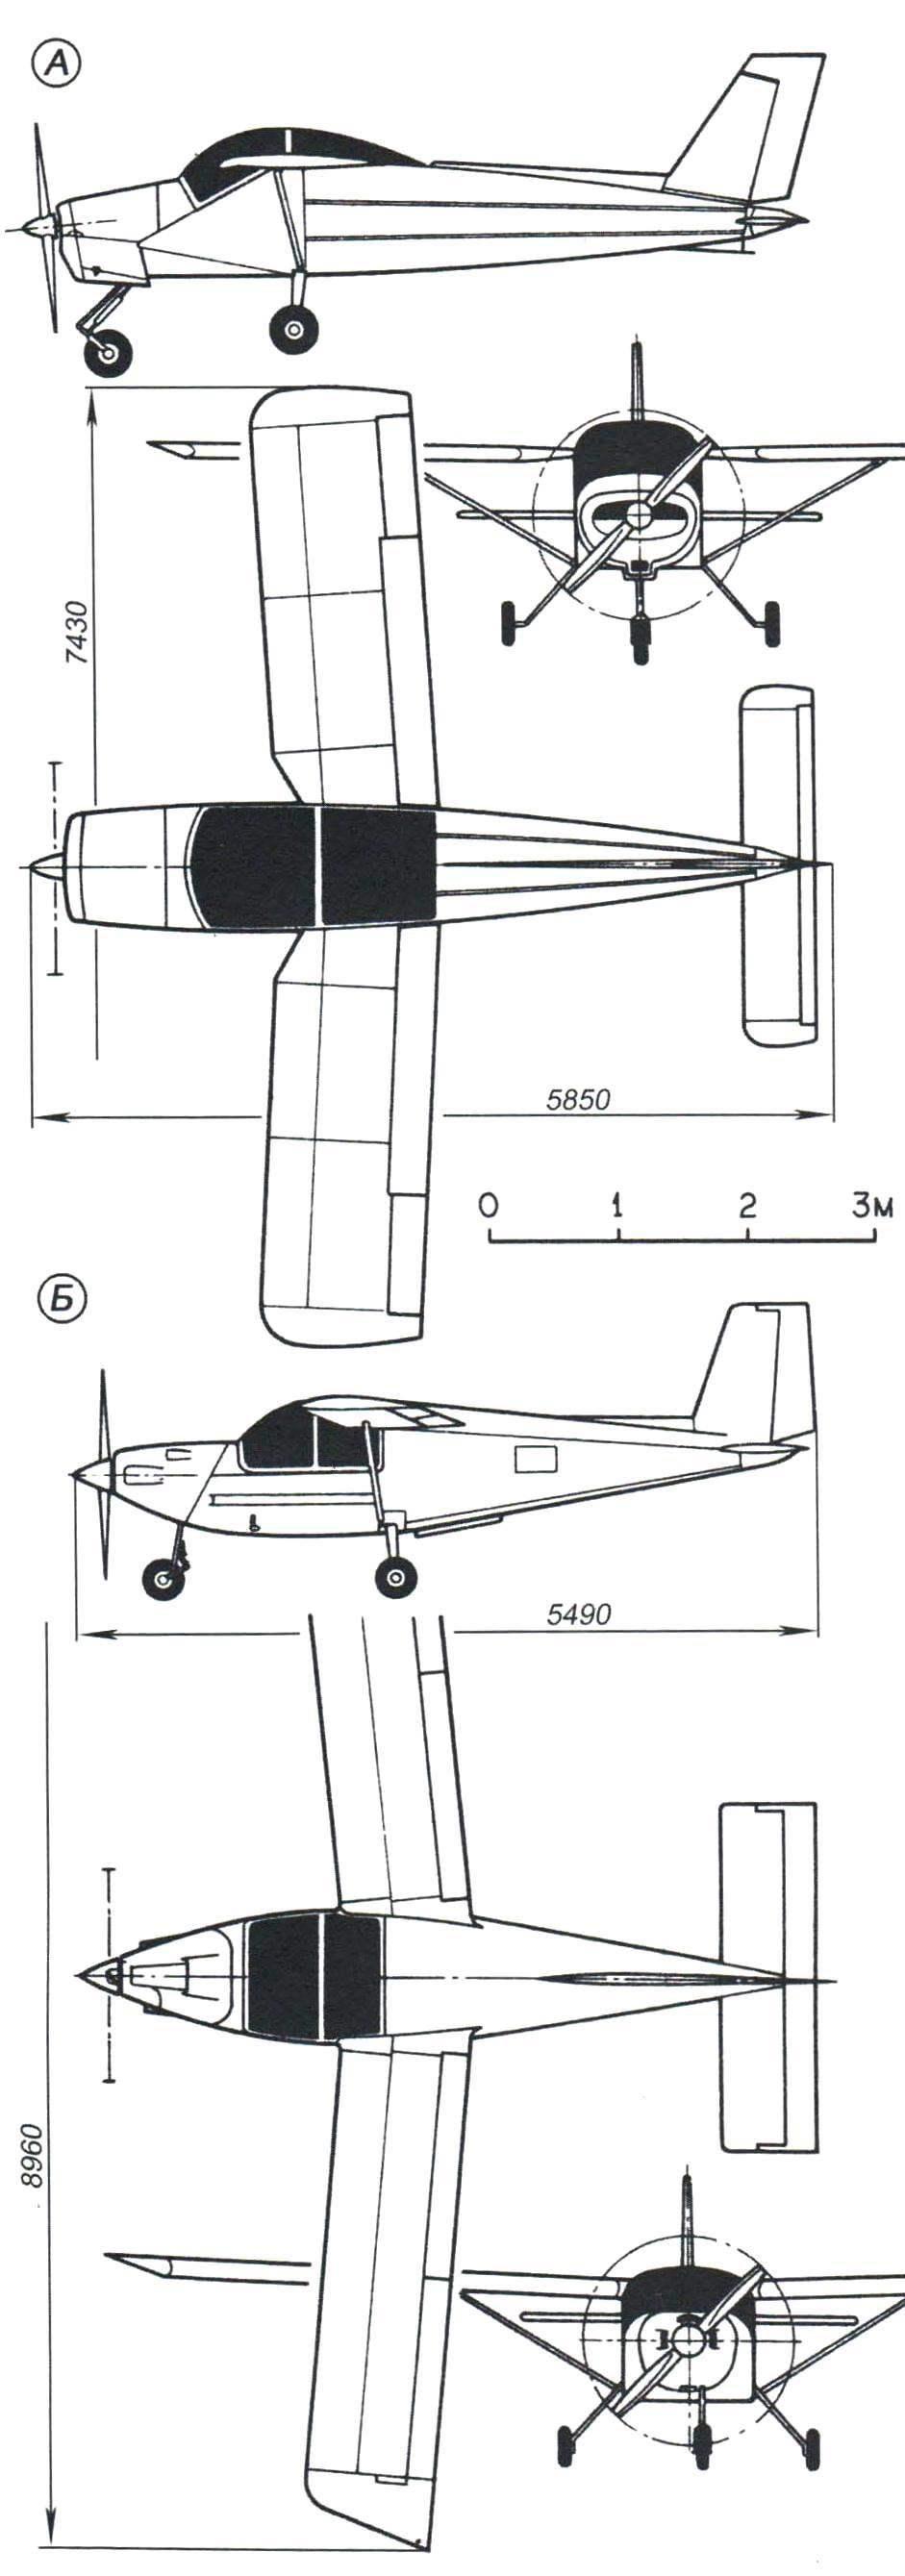 Light twin training aircraft-vysokopilya